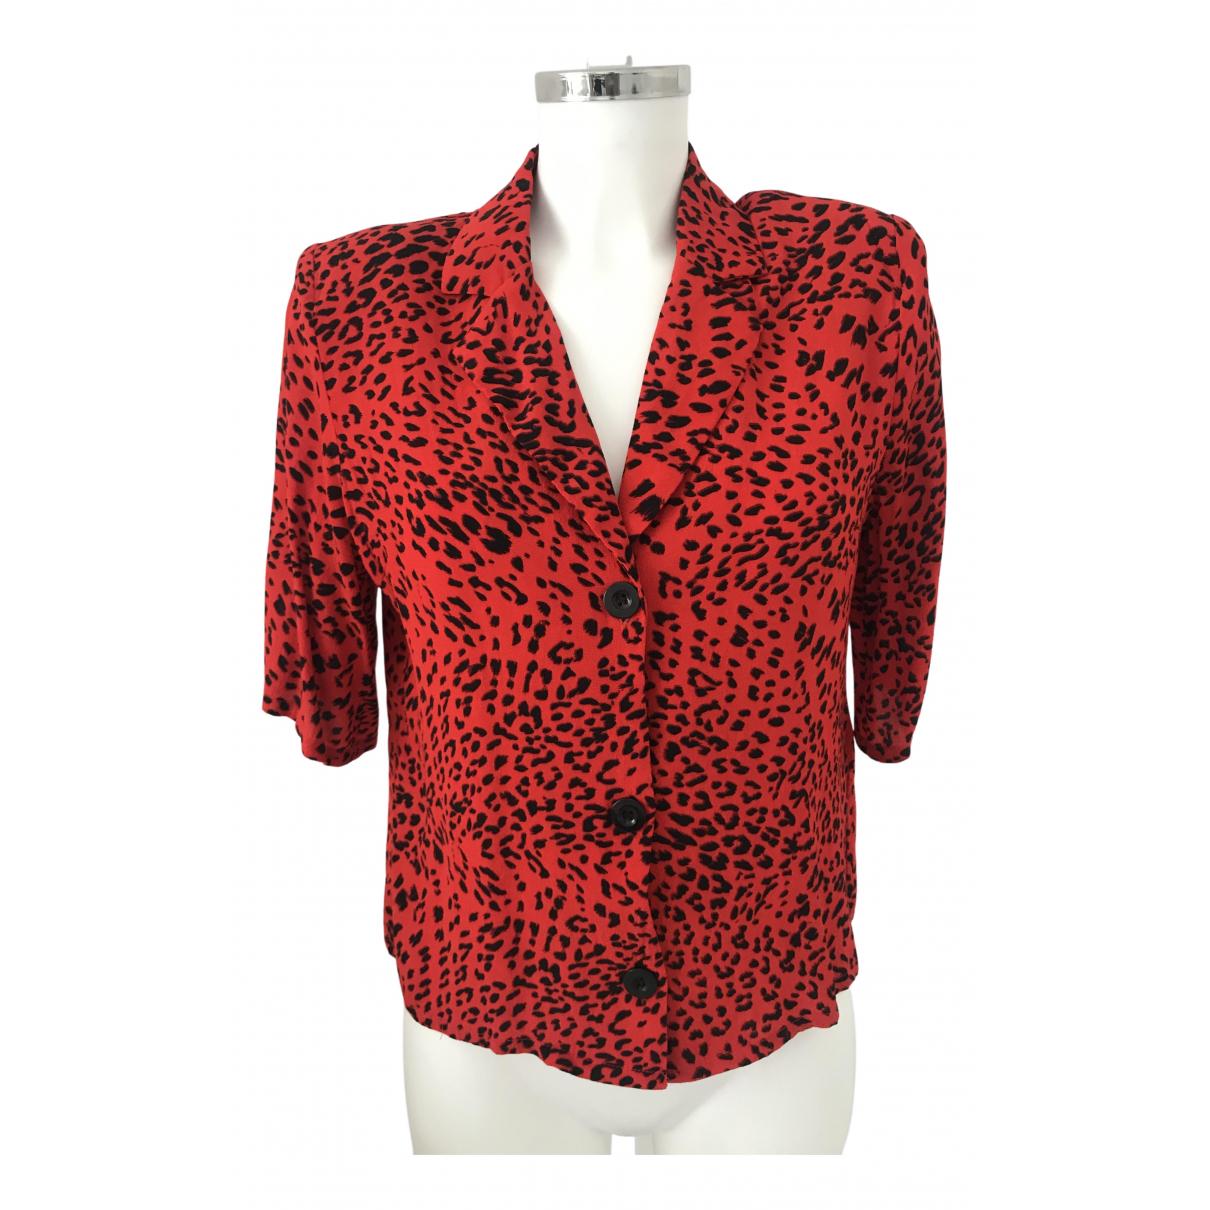 Gestuz \N Red jacket for Women S International